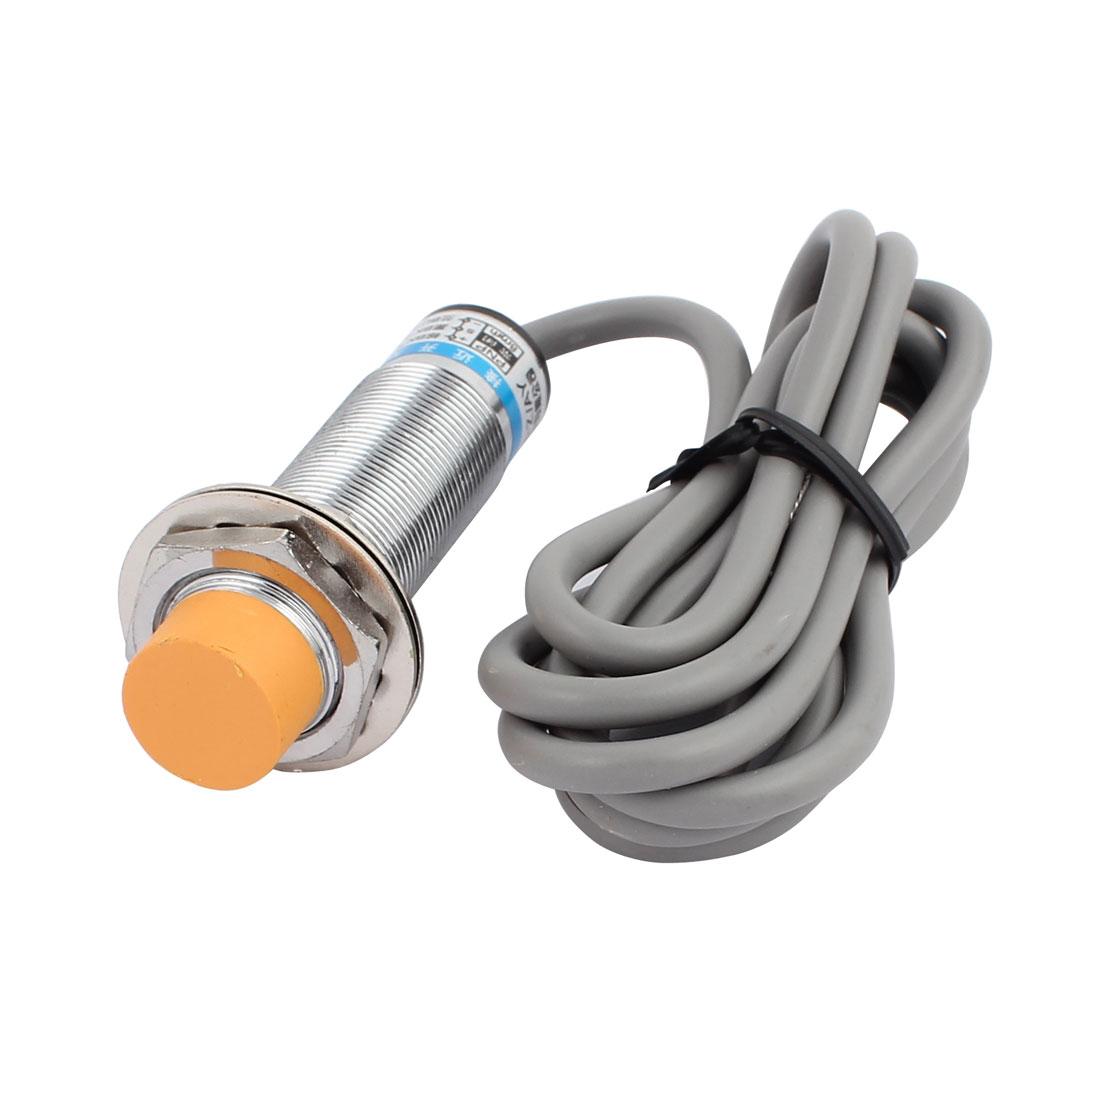 LJ18A3-8-Z/AY DC 6-36V 300mA PNP NC 8mm Inductive Proximity Sensor Switch 3-wire